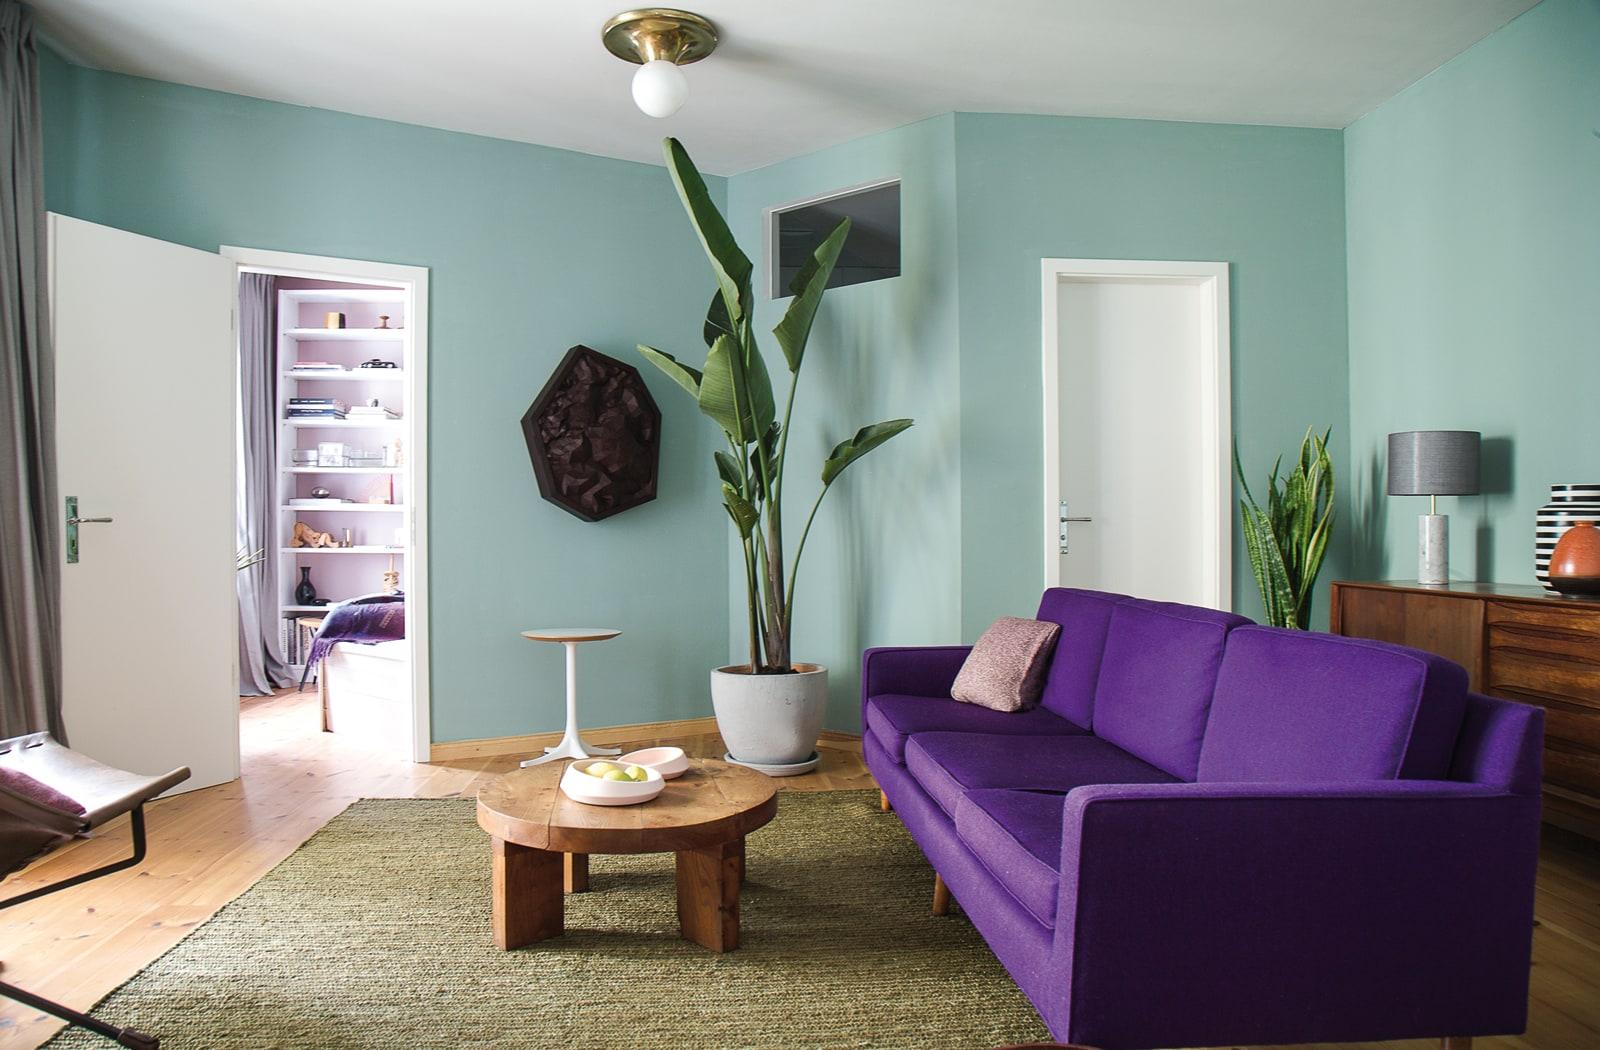 zementfliesen-terrazzofliesen-kreidefarbe-Jade-terrazzo-fugenlos-viaplatten-foto-vintagency | Kreidefarbe Jade 2500 ml